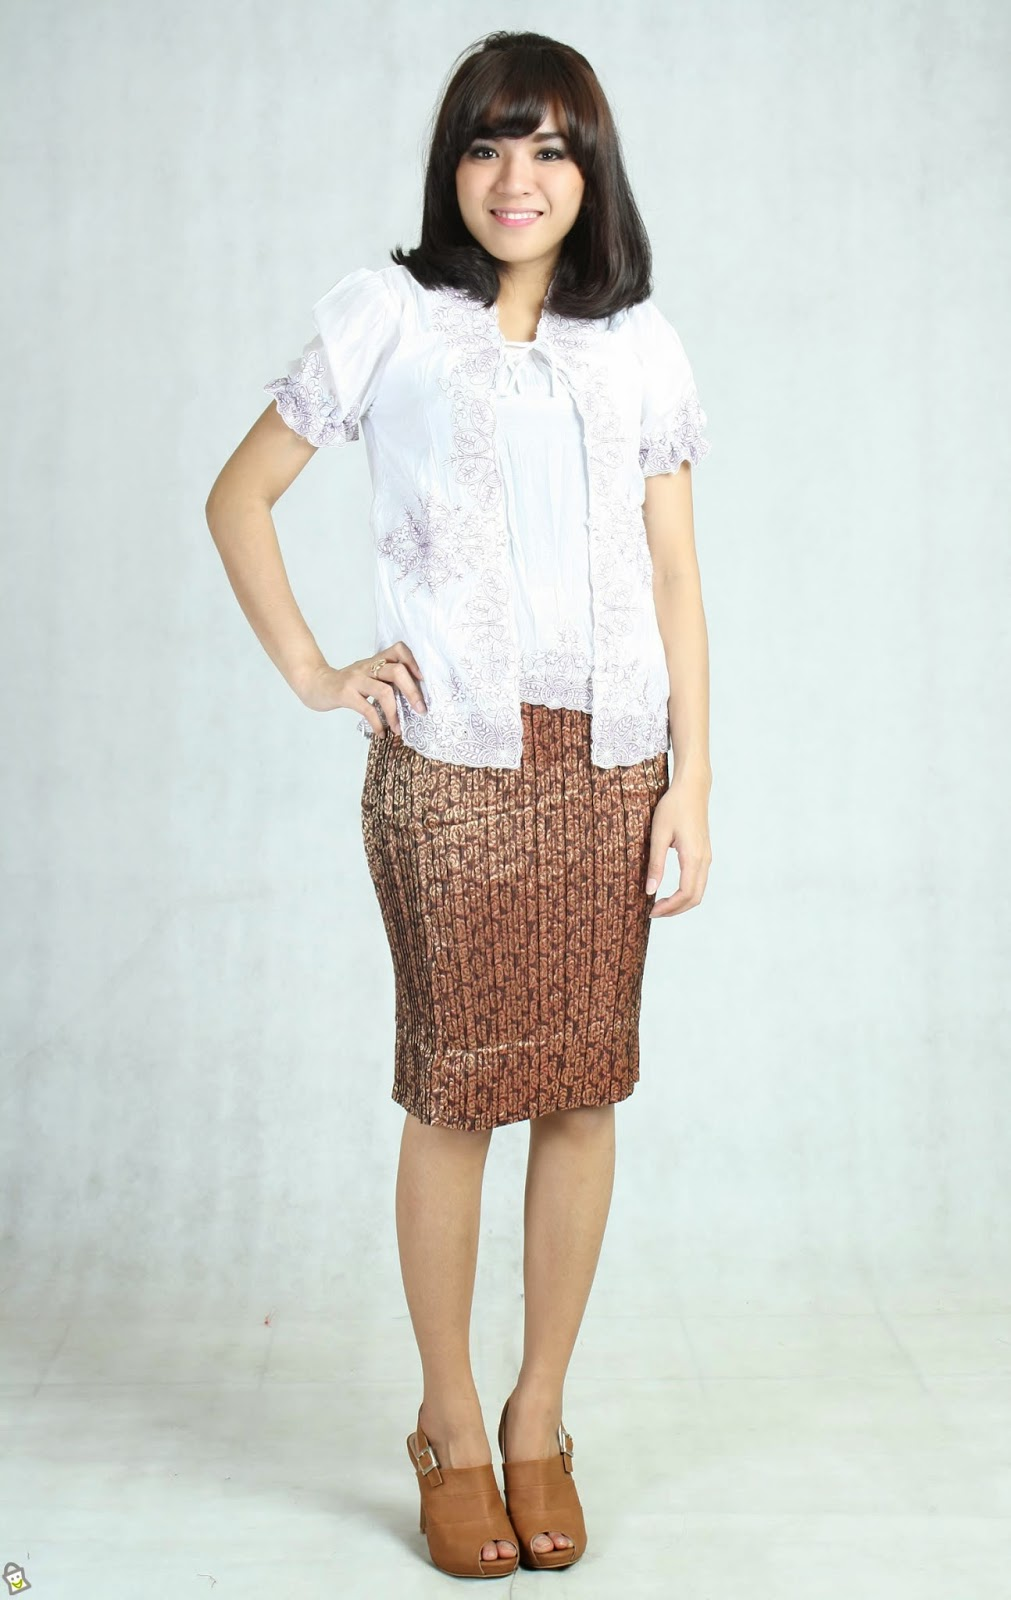 Wohnzimmermbel Modern Modell : Ragam model baju kebaya lengan pendek kumpulan